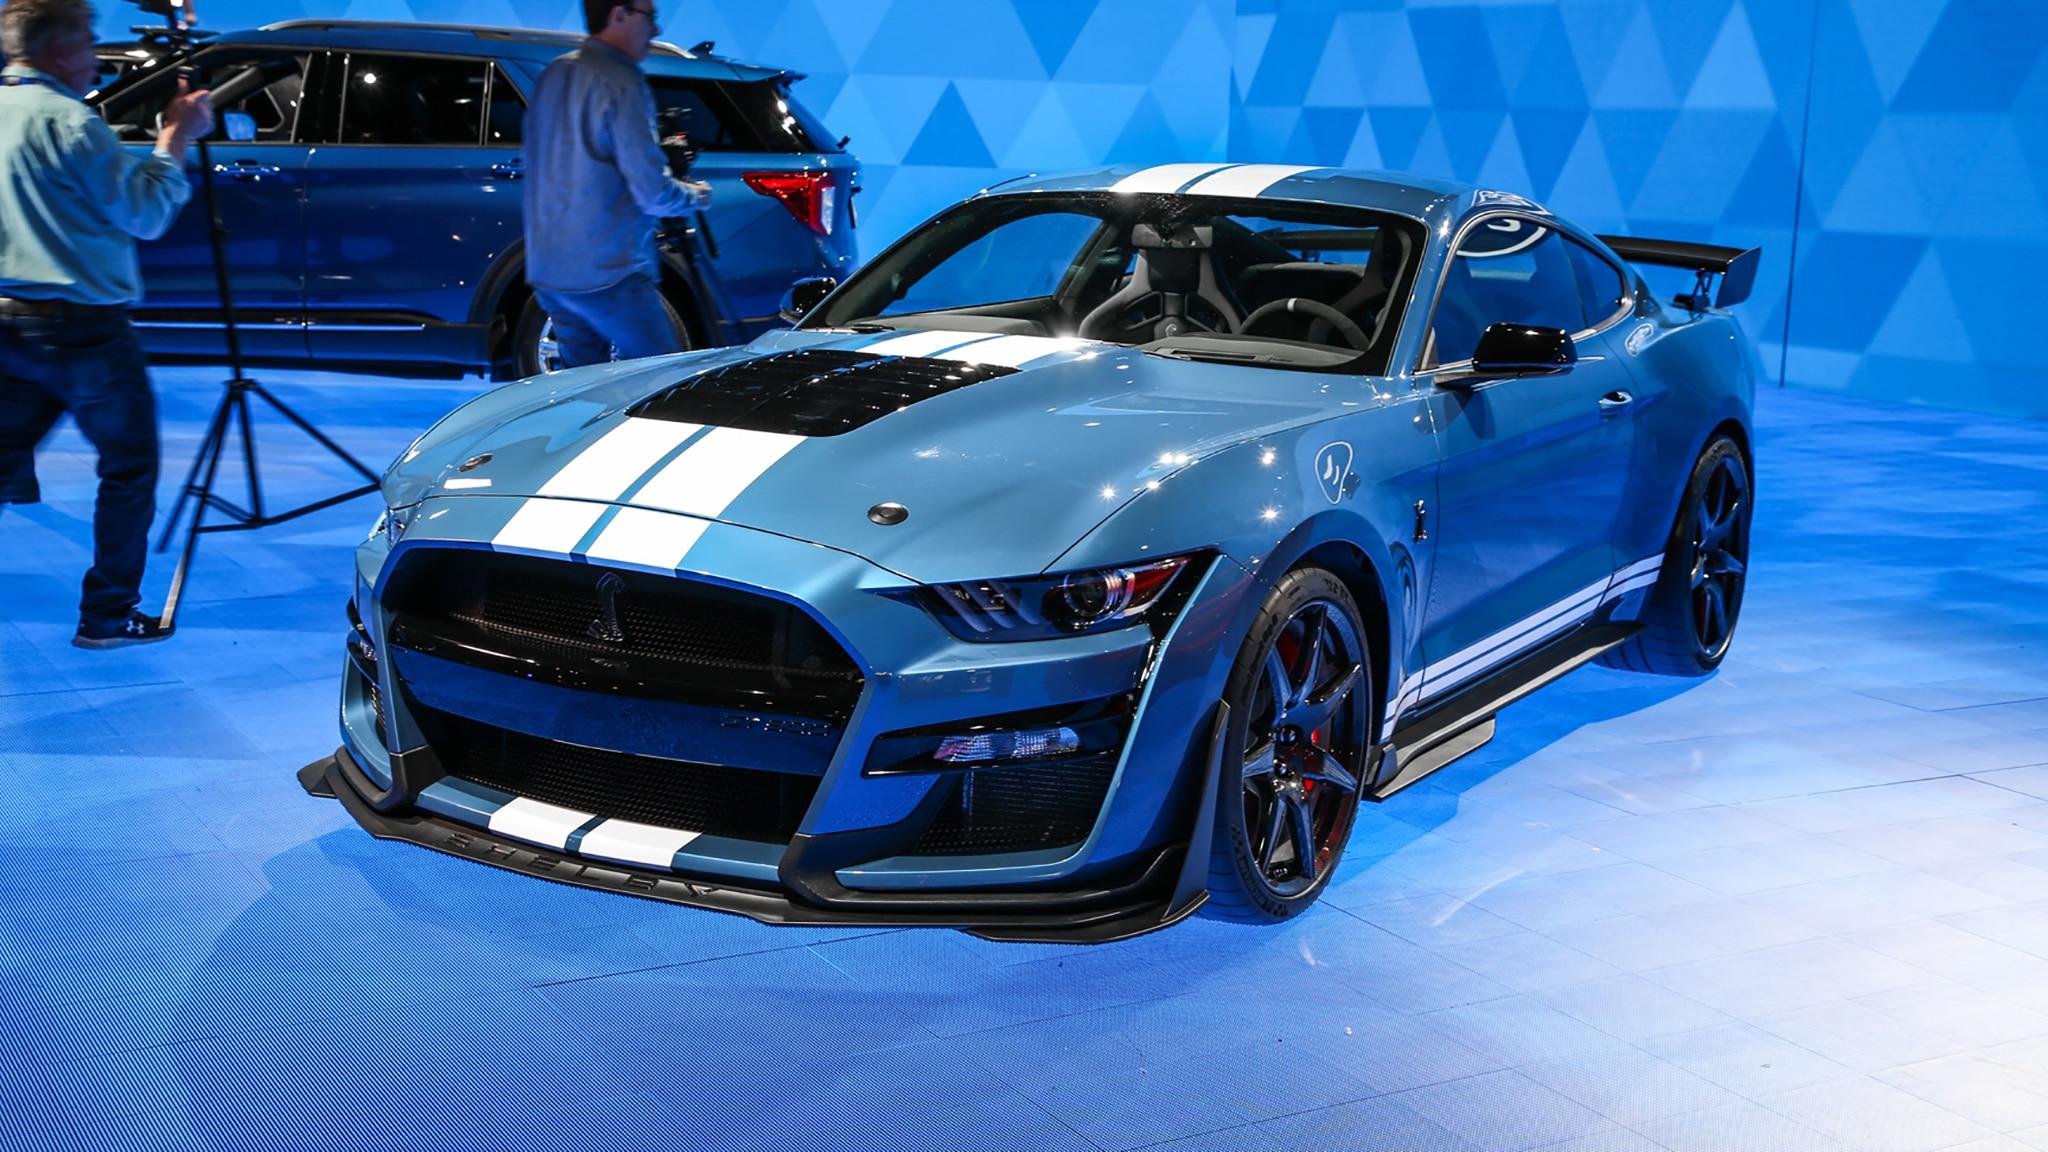 2020 Ford Mustang Shelby GT500 - Motor Trend en Español